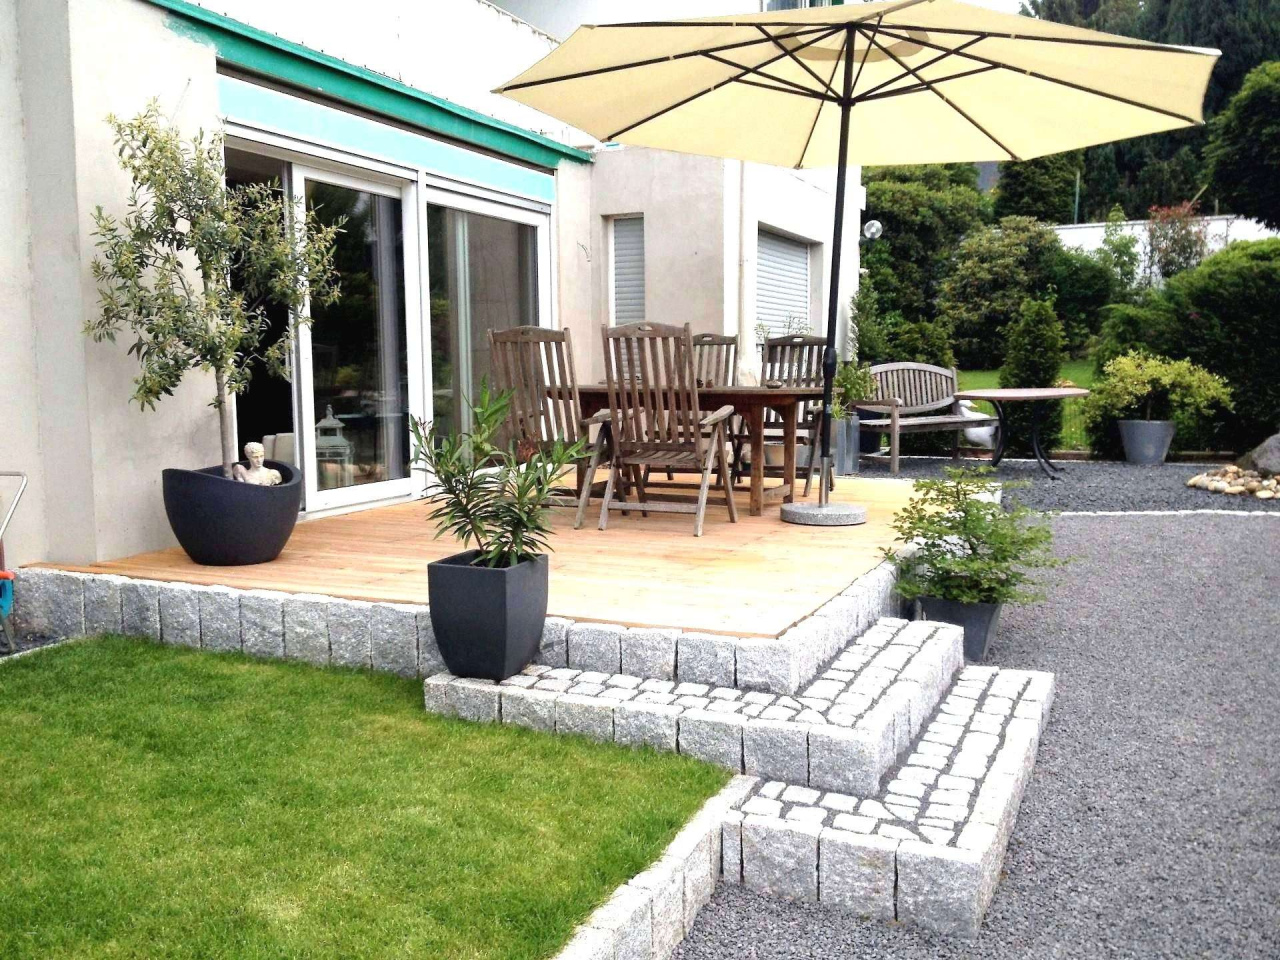 Gartenideen Terrasse Genial Bamboo Patio Shades Balkon Bambus 2019 Elegant